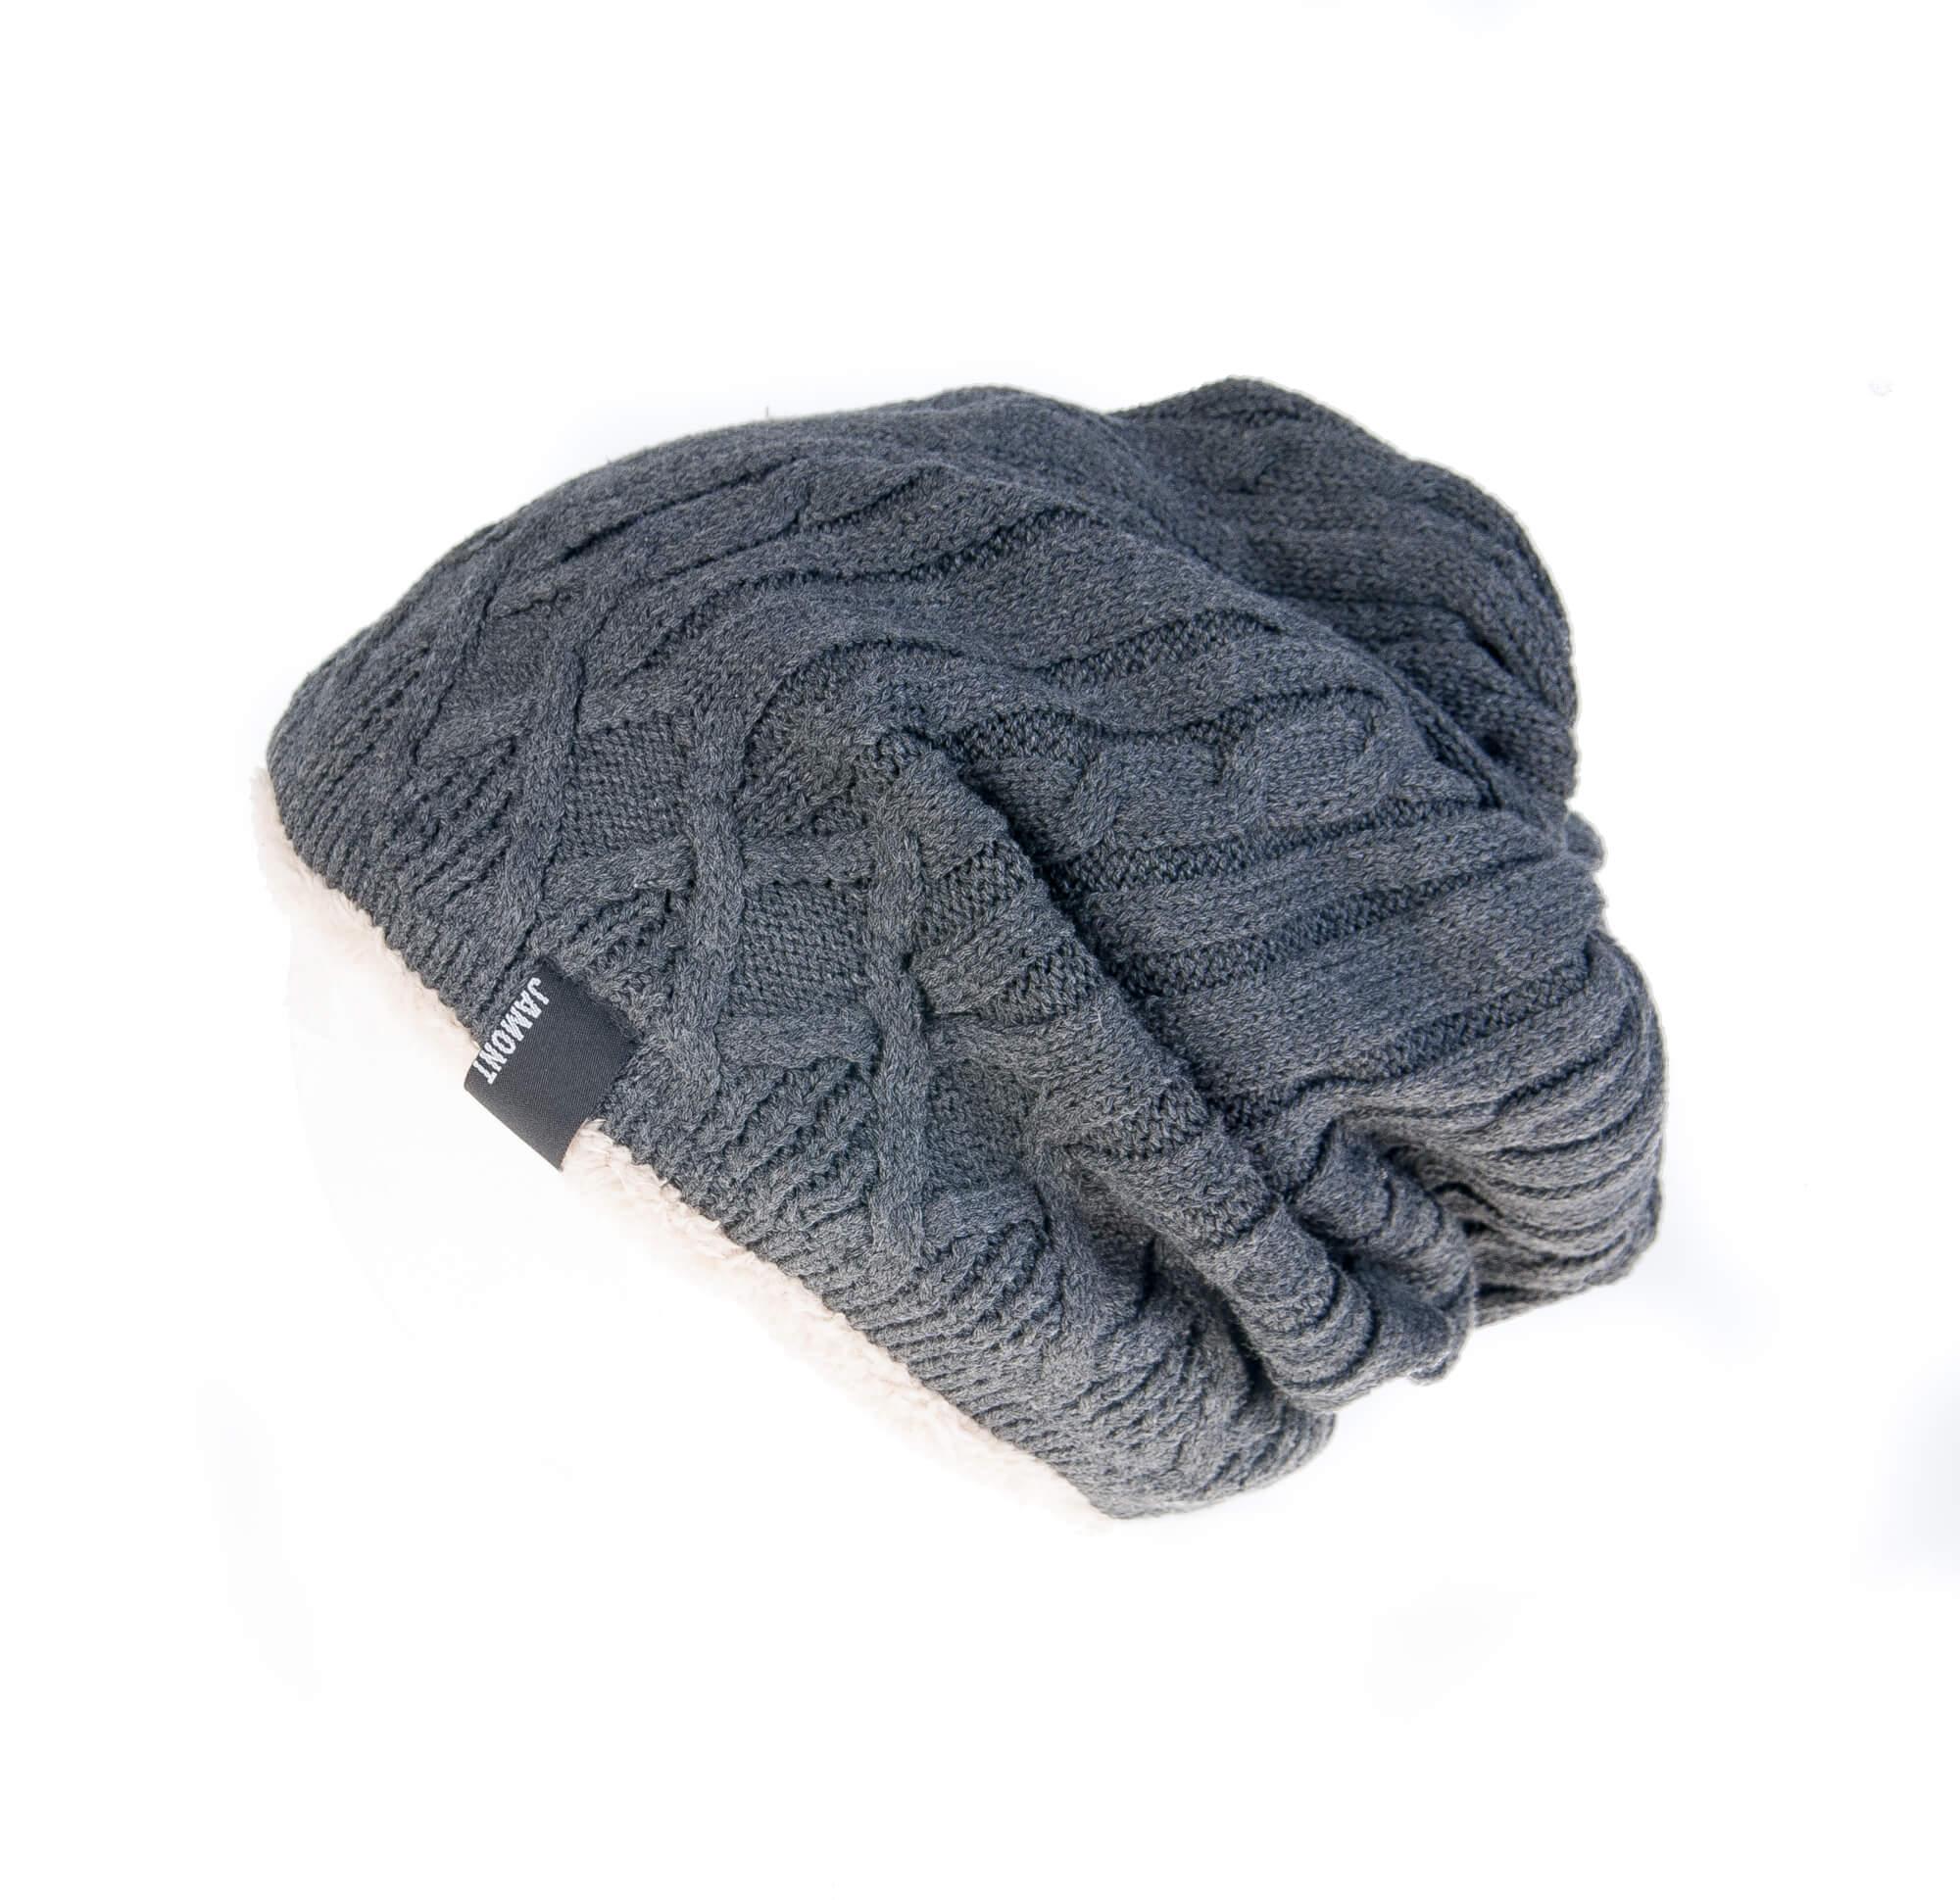 کلاه طرح دار مردانه JAMONT – پشمی HW1001